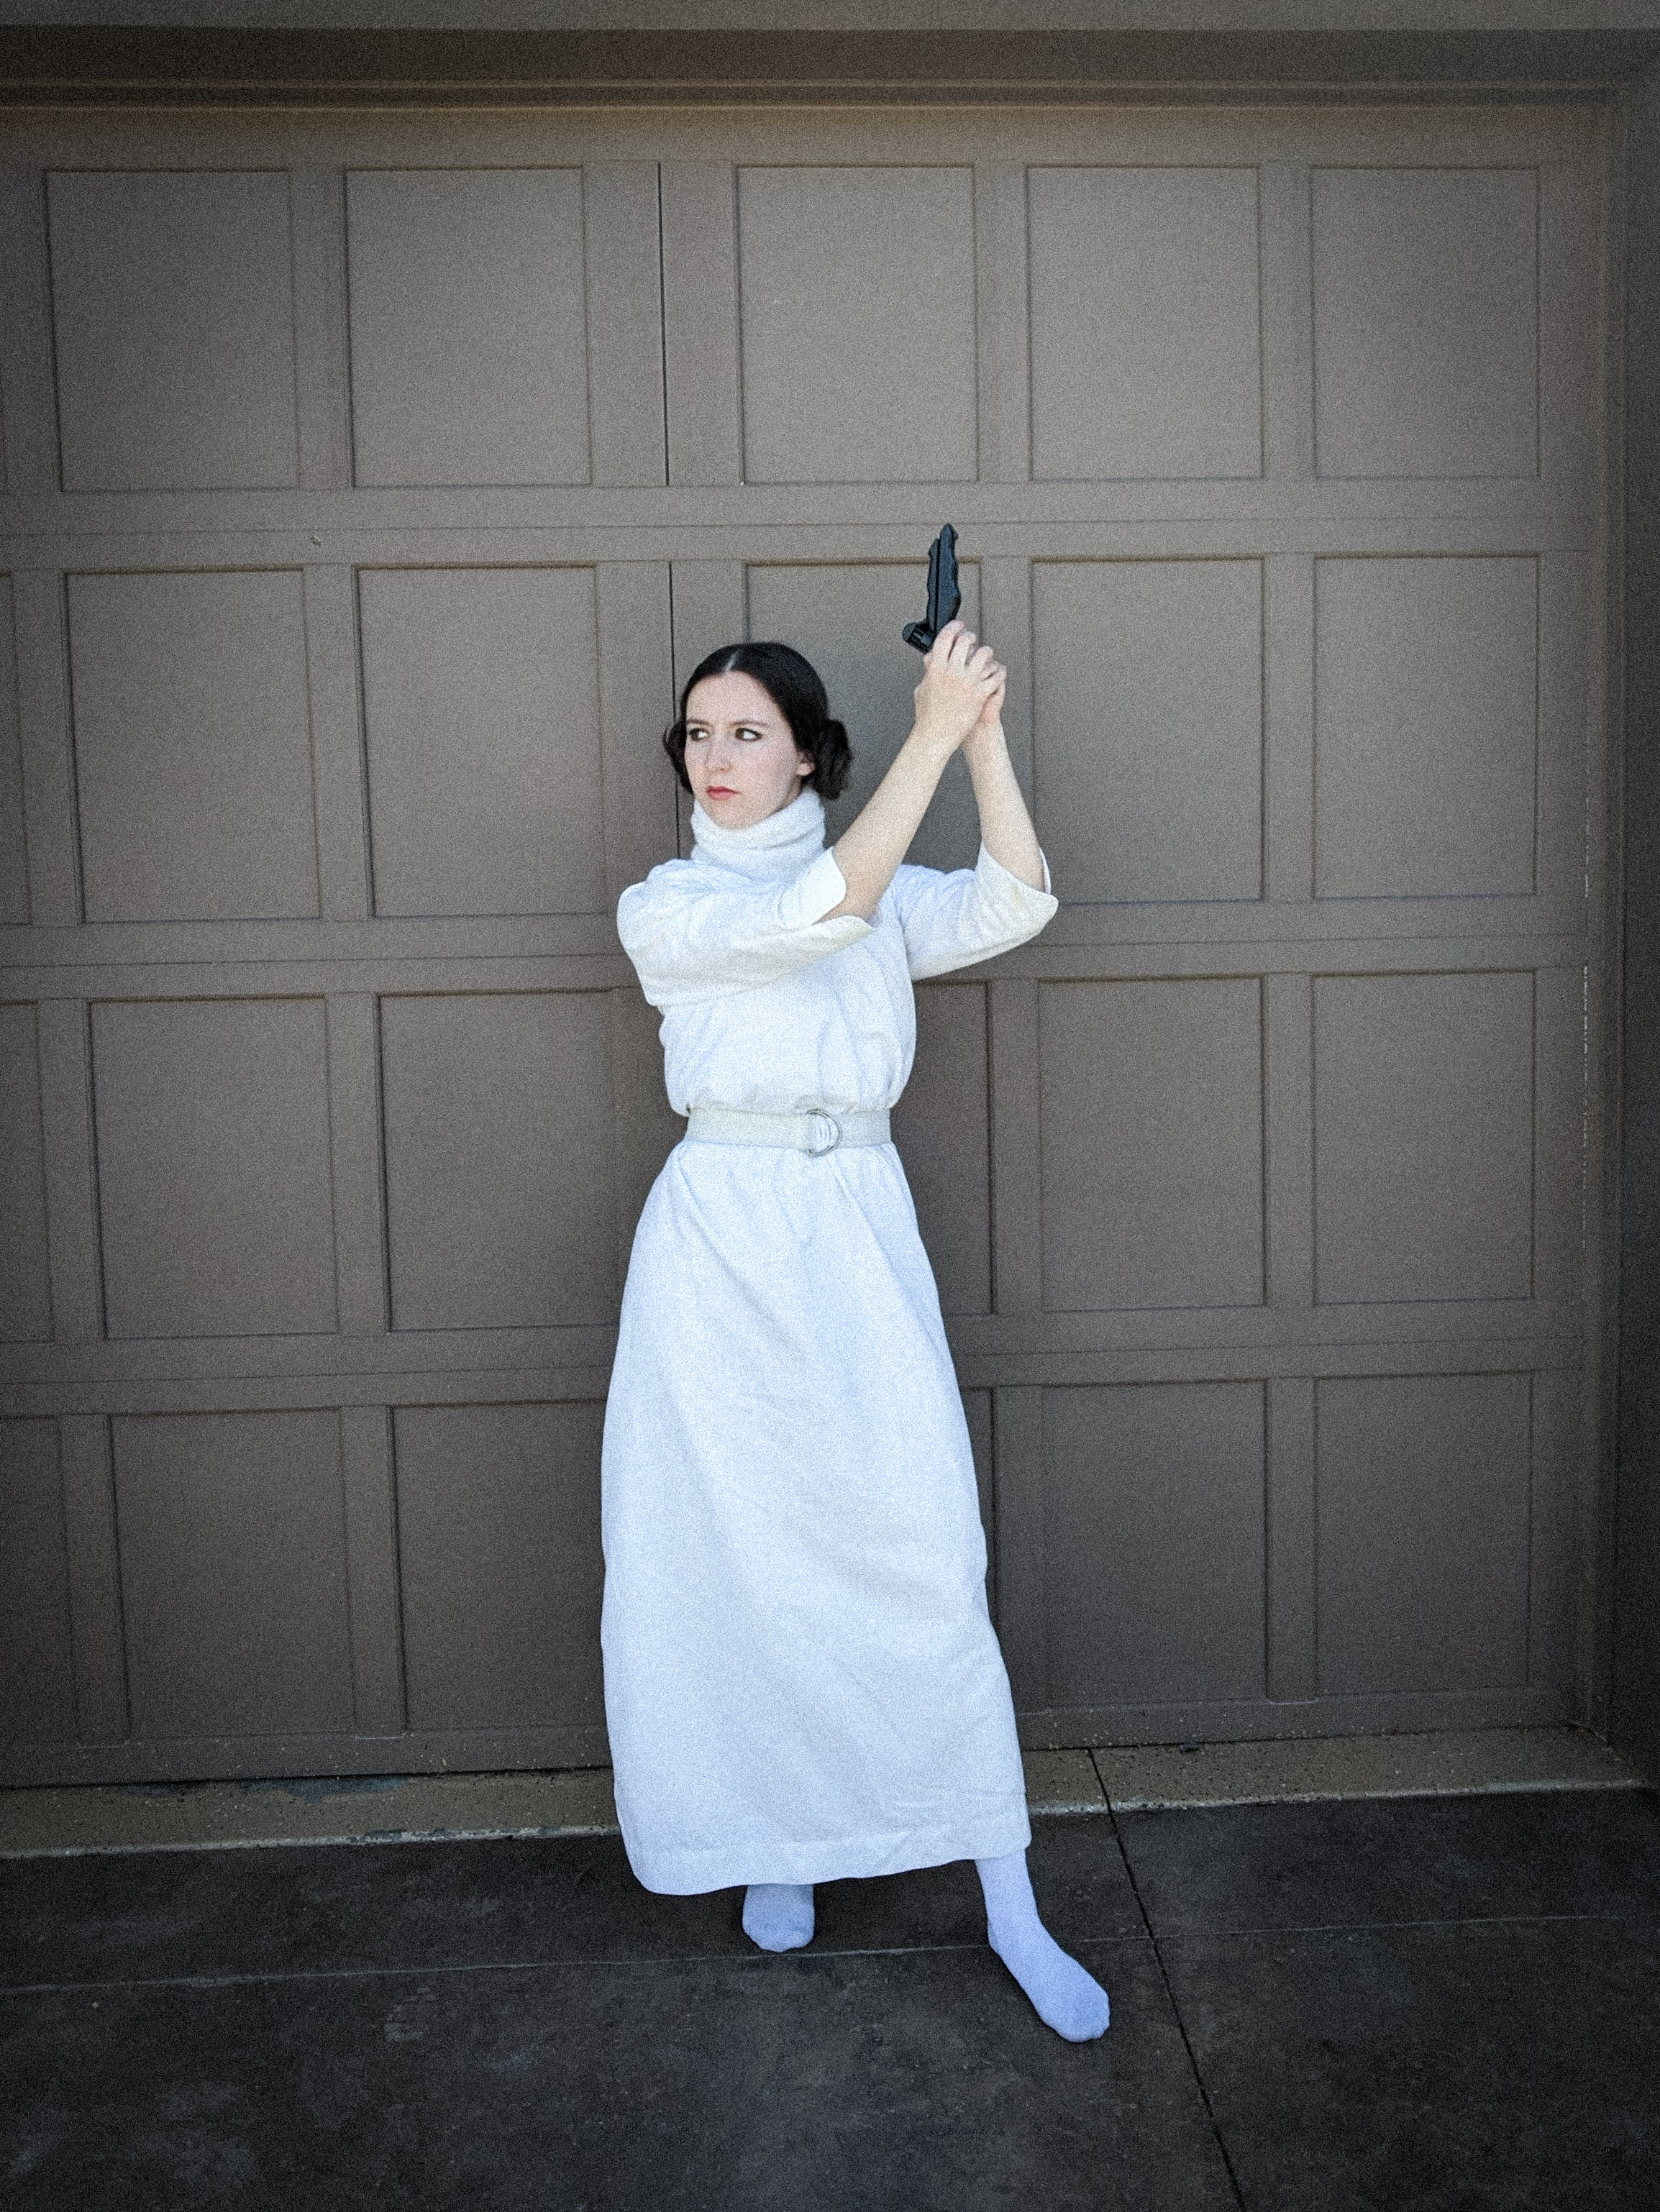 Princess Leia costume, homemade costume, Star Wars day